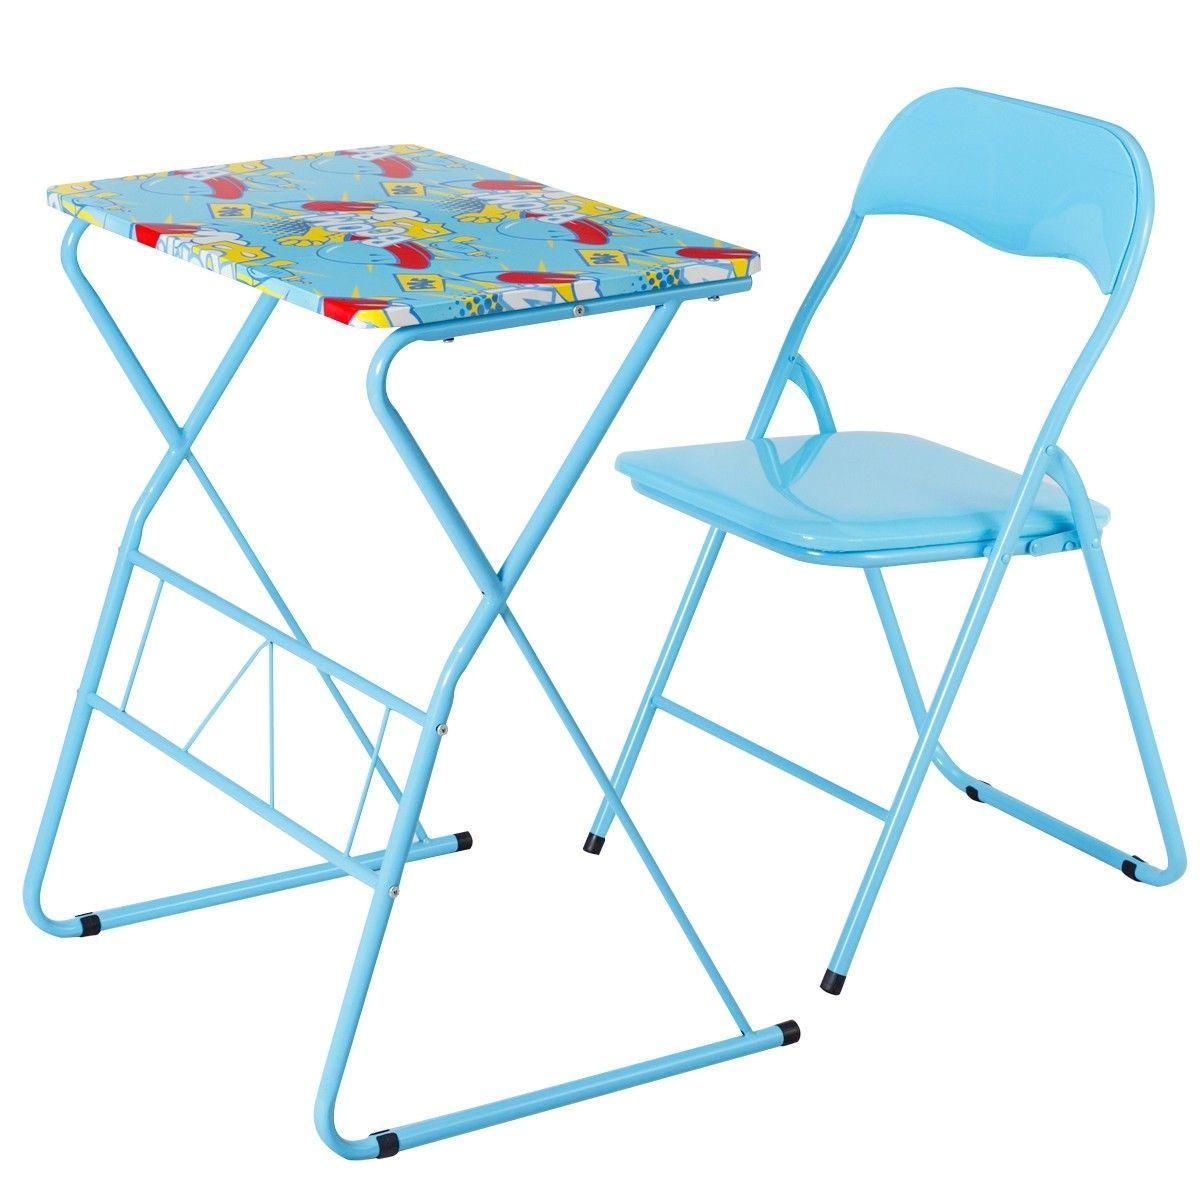 - Home School Kids Study Writing Folding Table Chair Set $38.95 +